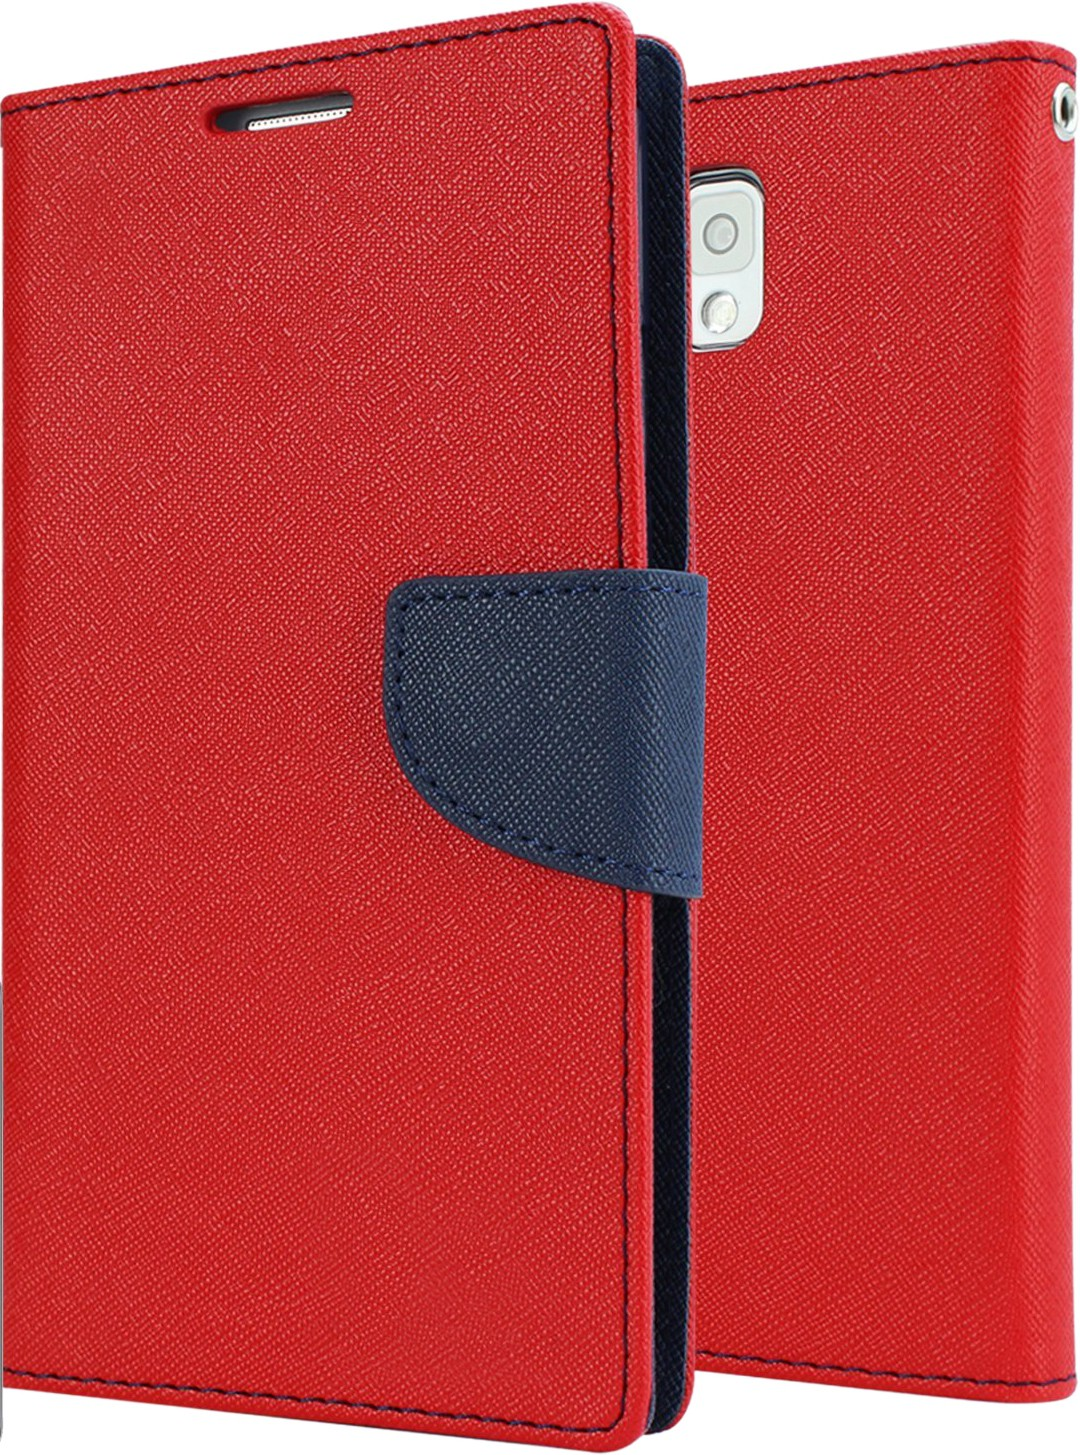 Ape Flip Cover for Samsung Galaxy J5